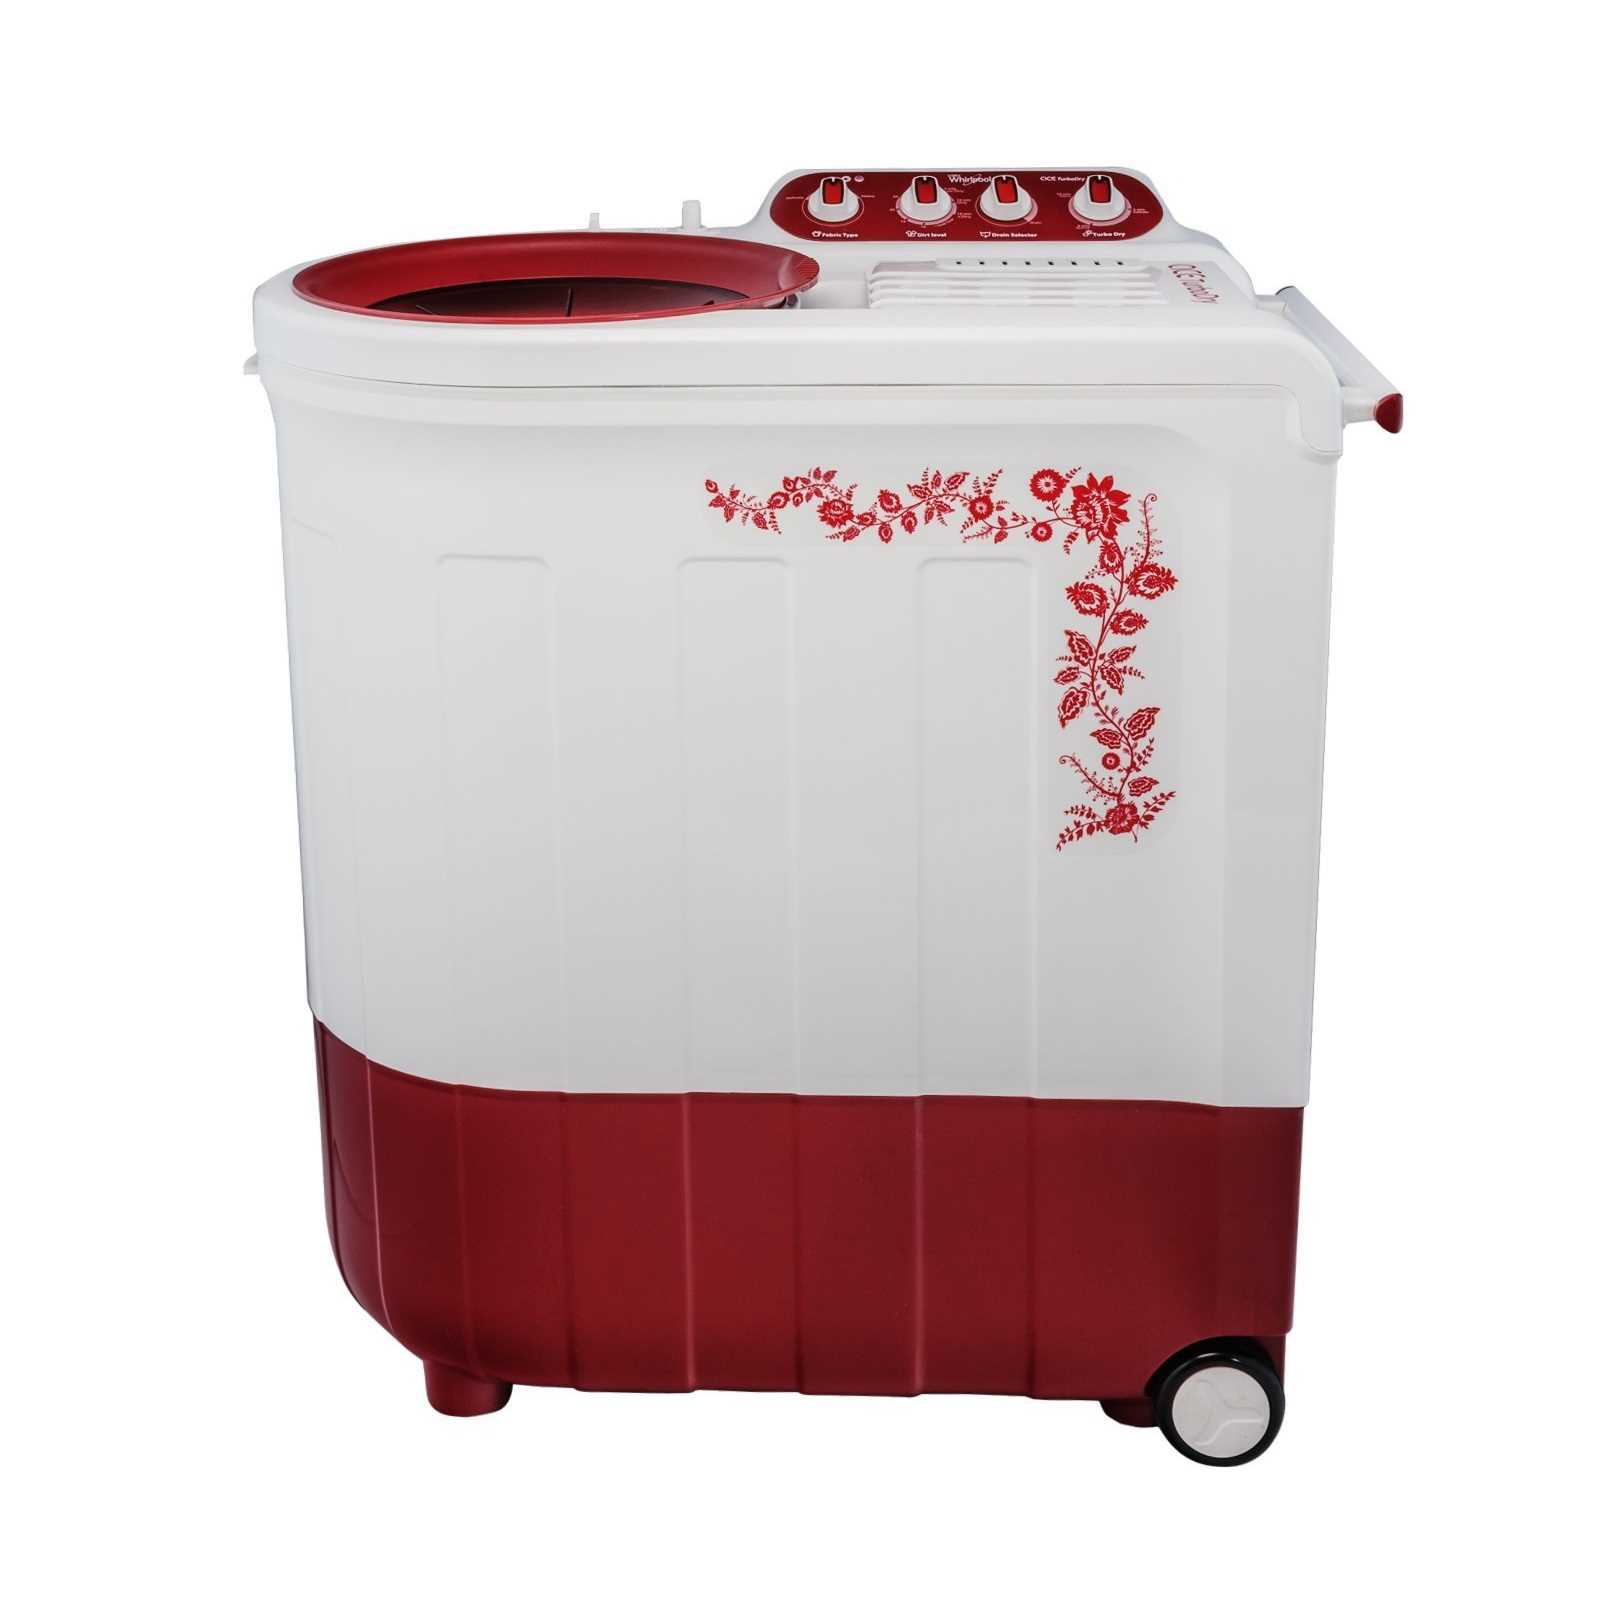 Whirlpool Ace Turbo Dry 8.2 kg Semi Automatic Top Loading Washing Machine